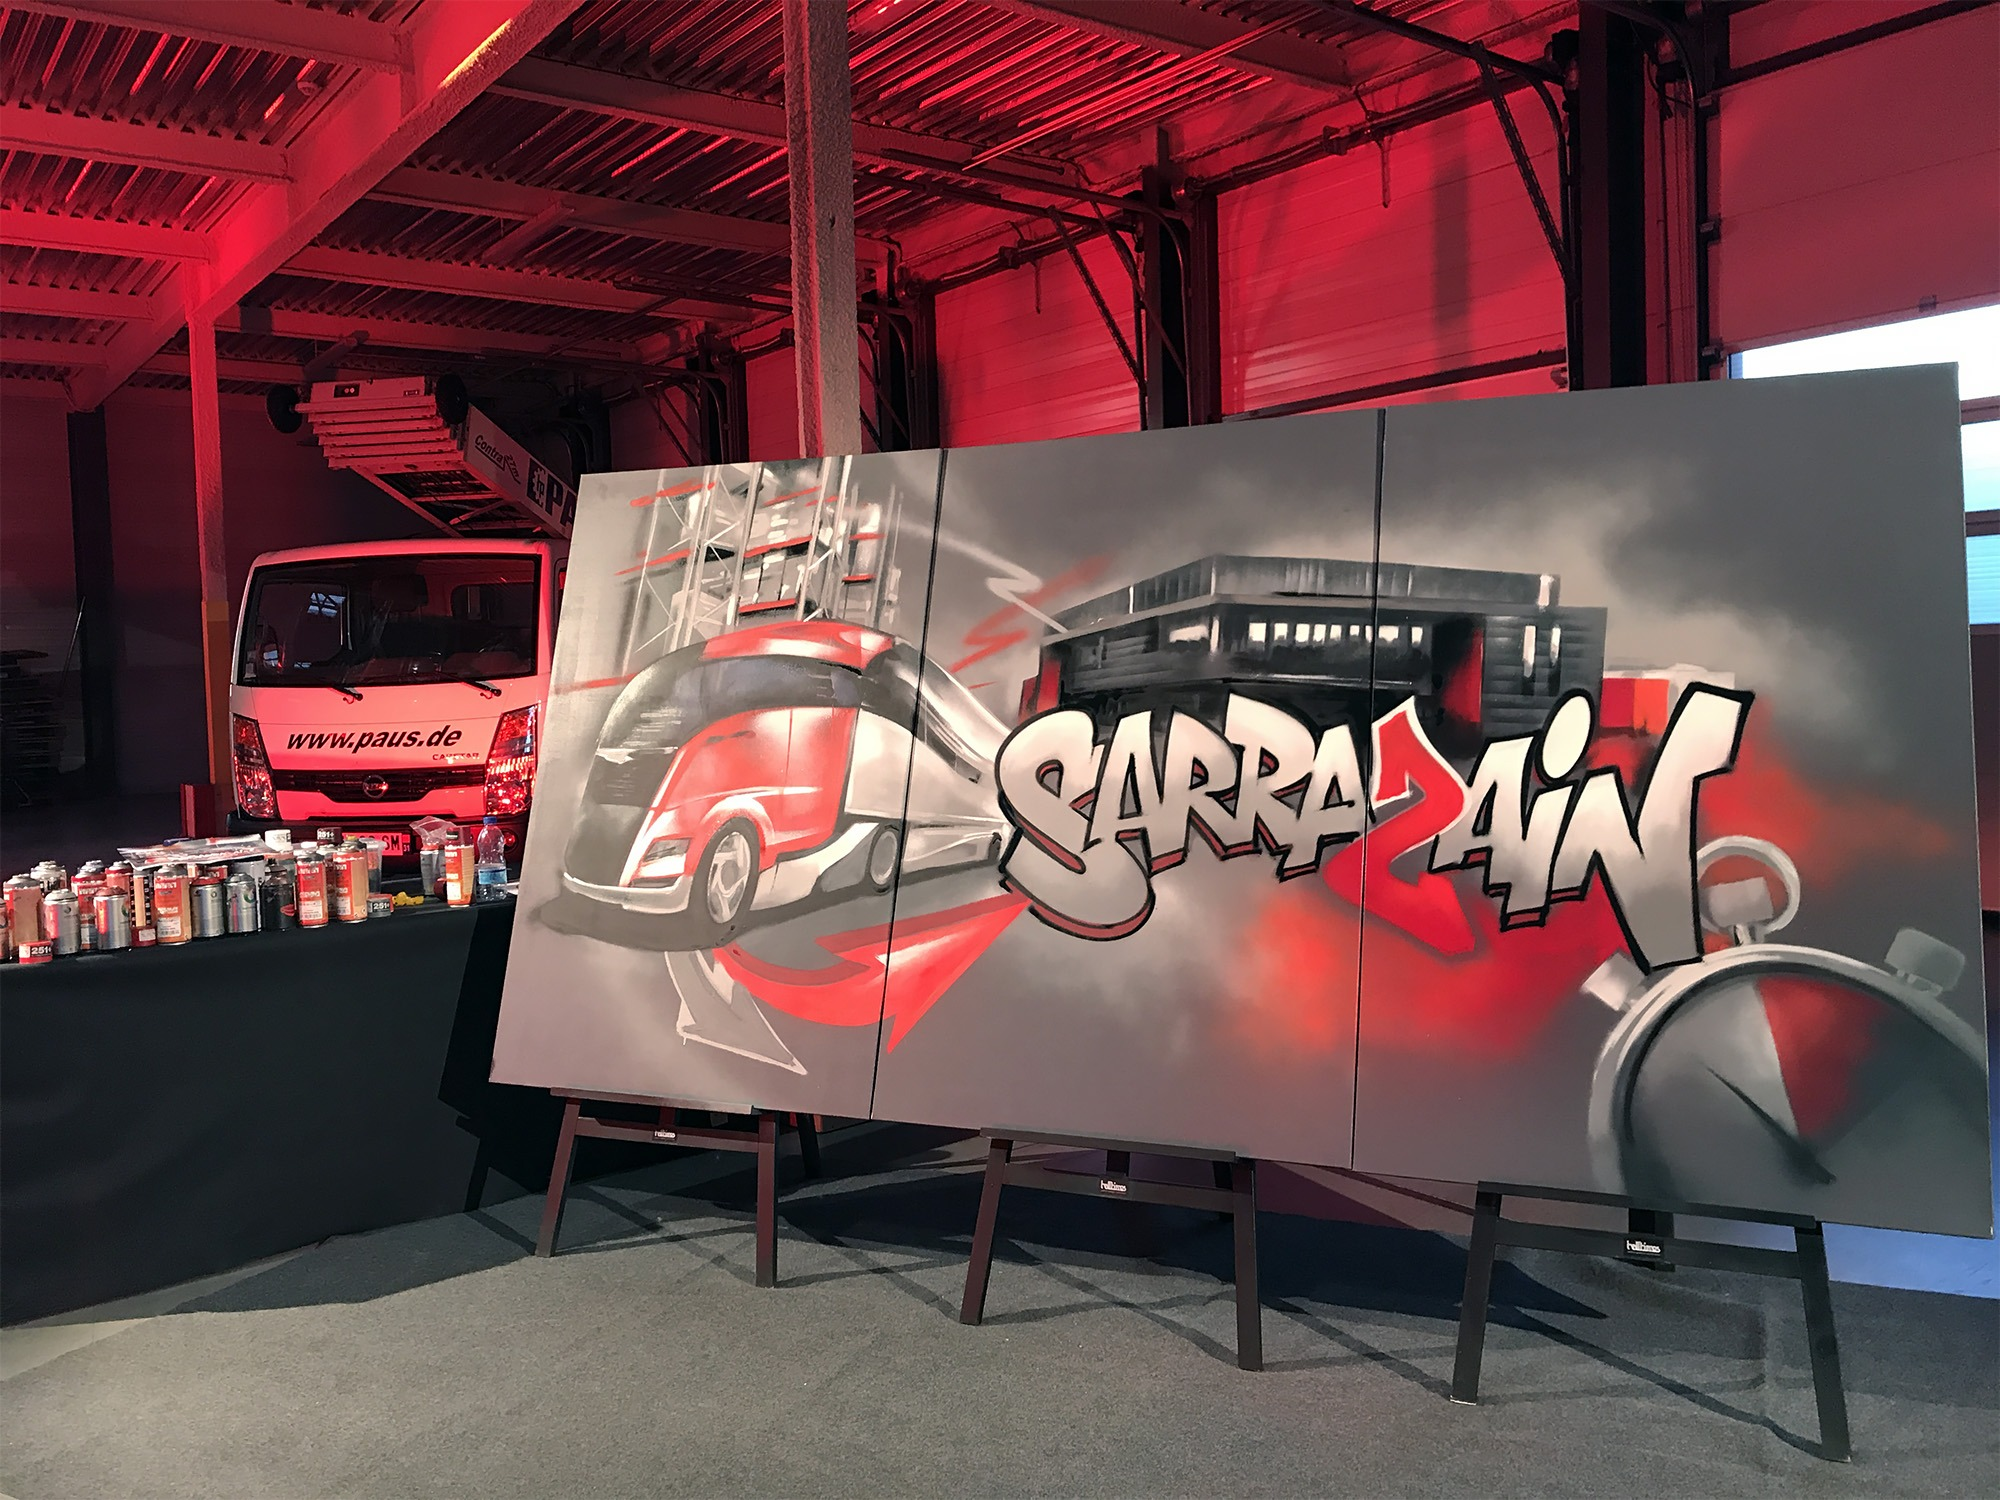 03-transport-sarrazain-live-paint-performance-graff copie